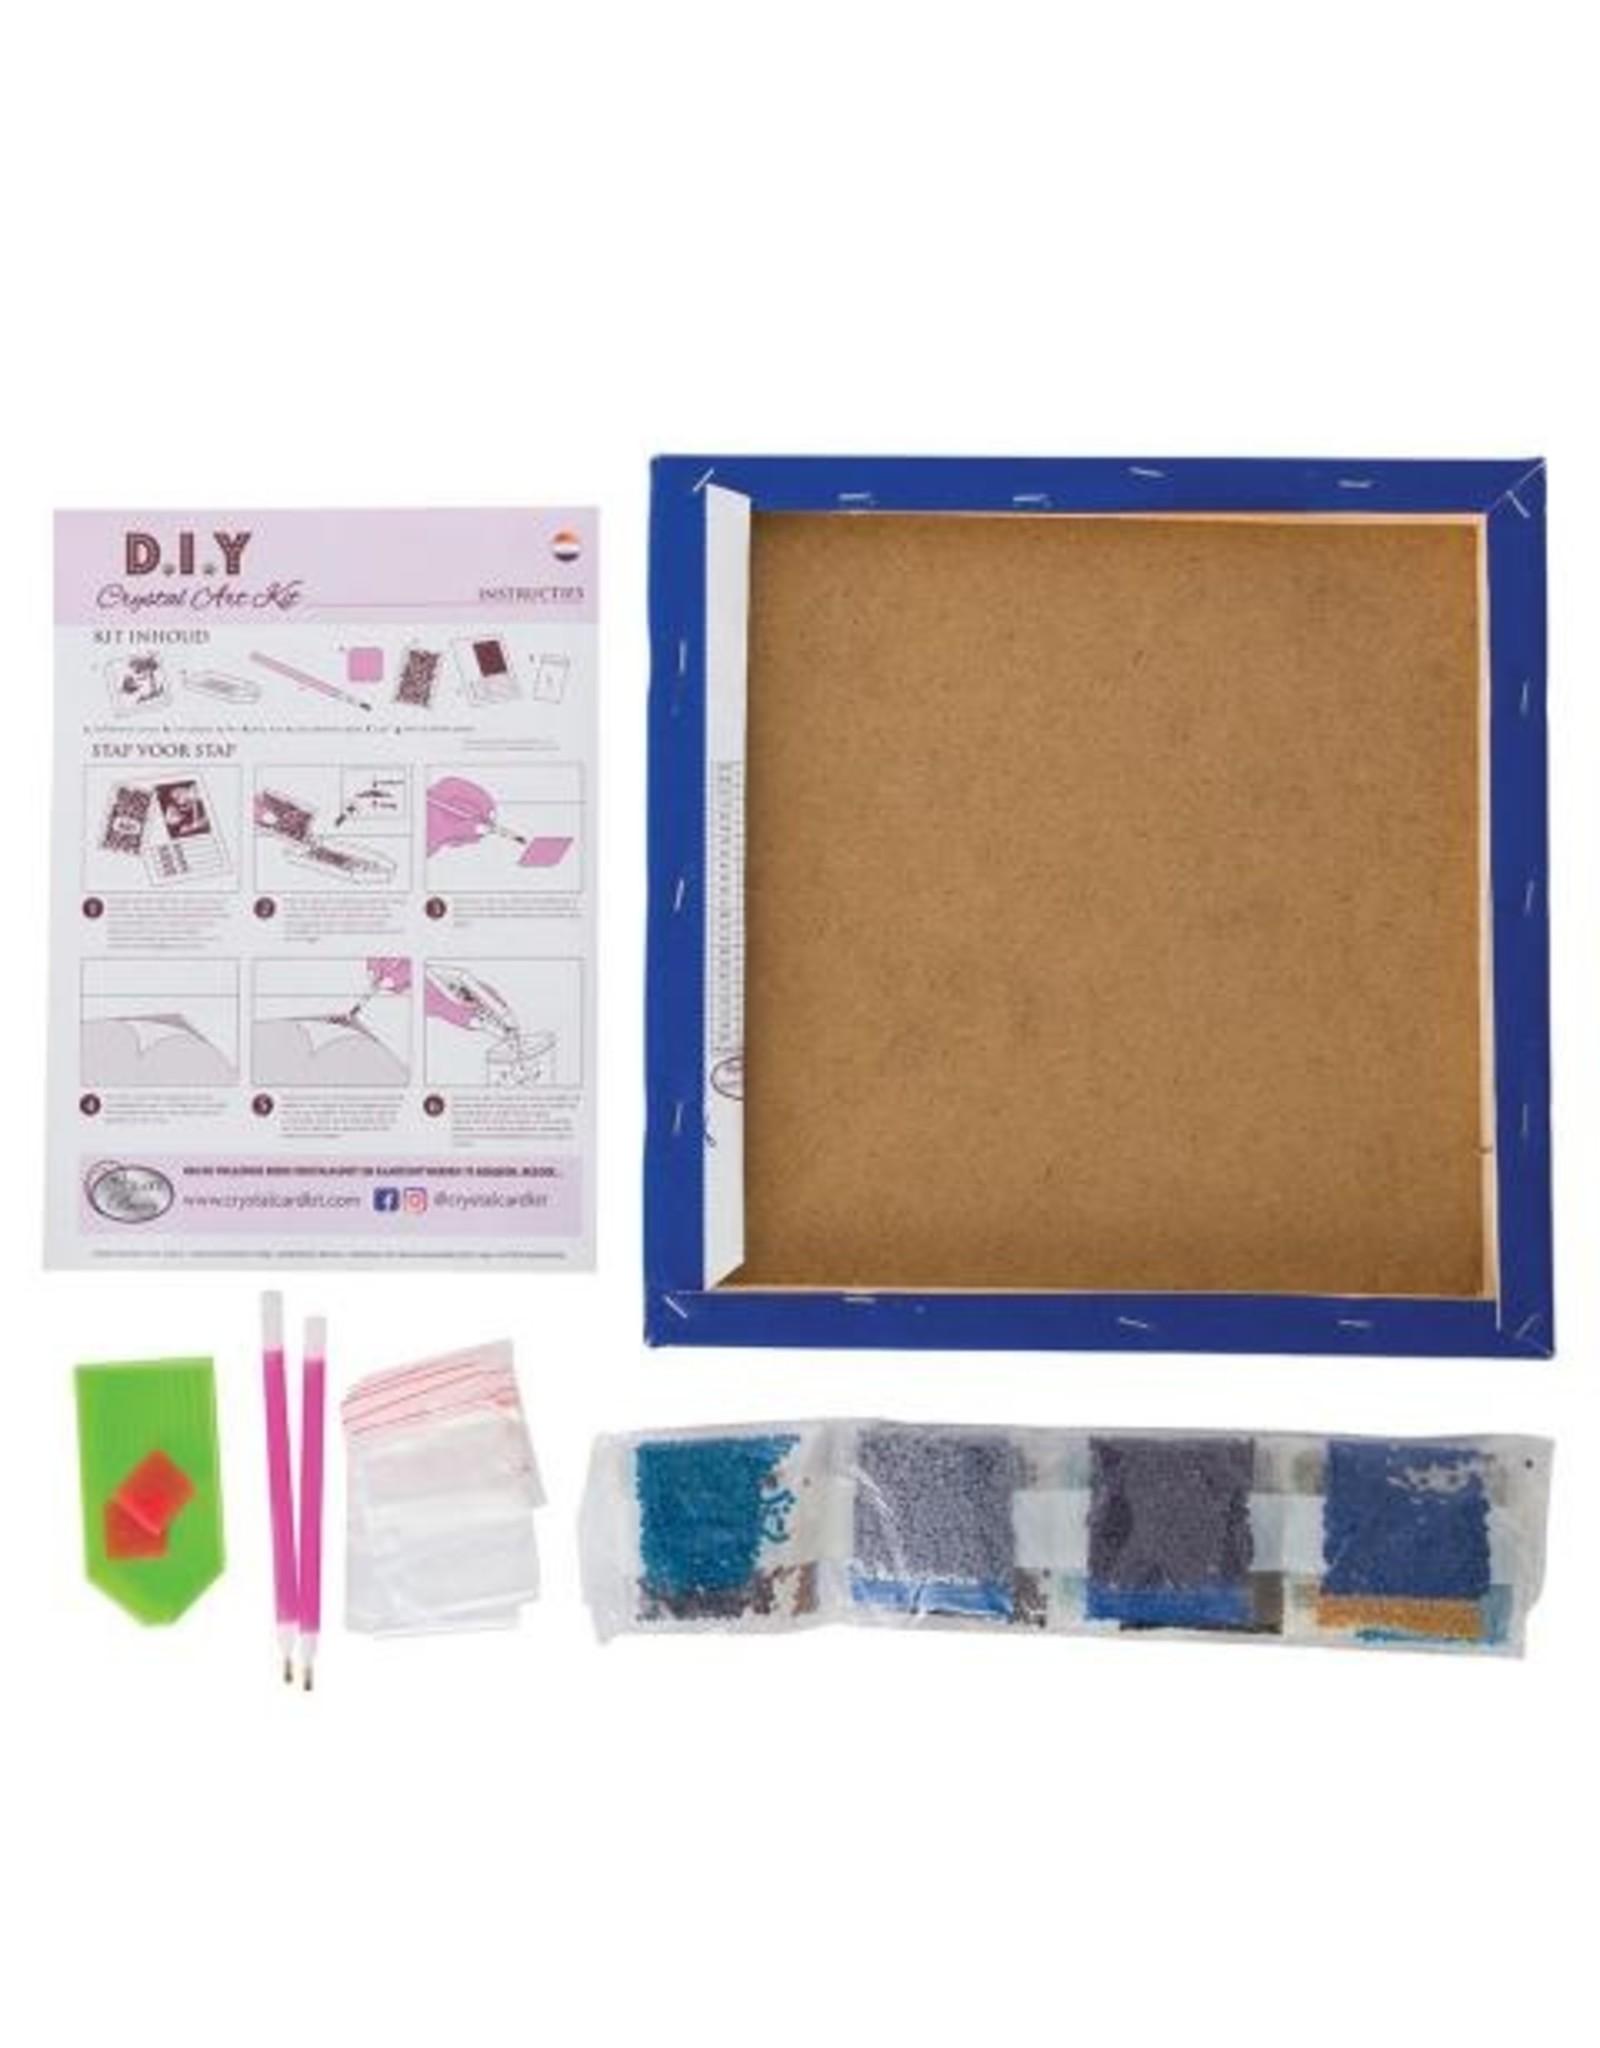 D.I.Y Crystal Art Kit Crystal Art Medium Framed Kit - Howling Wolves